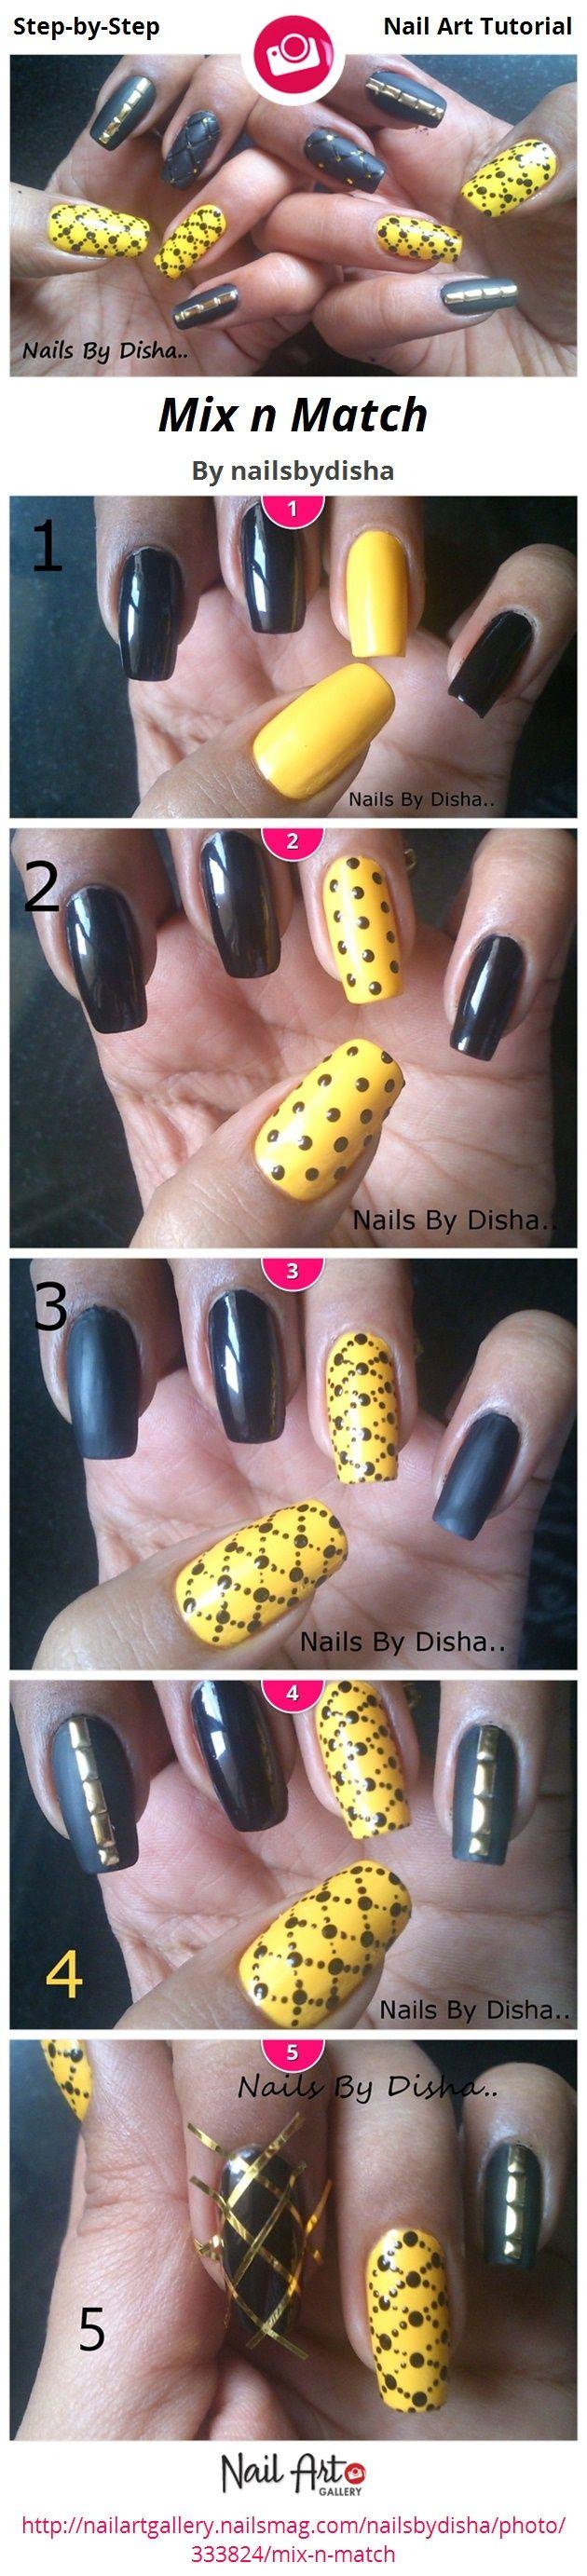 Mix n Match by nailsbydisha - Nail Art Gallery Step-by-Step ...